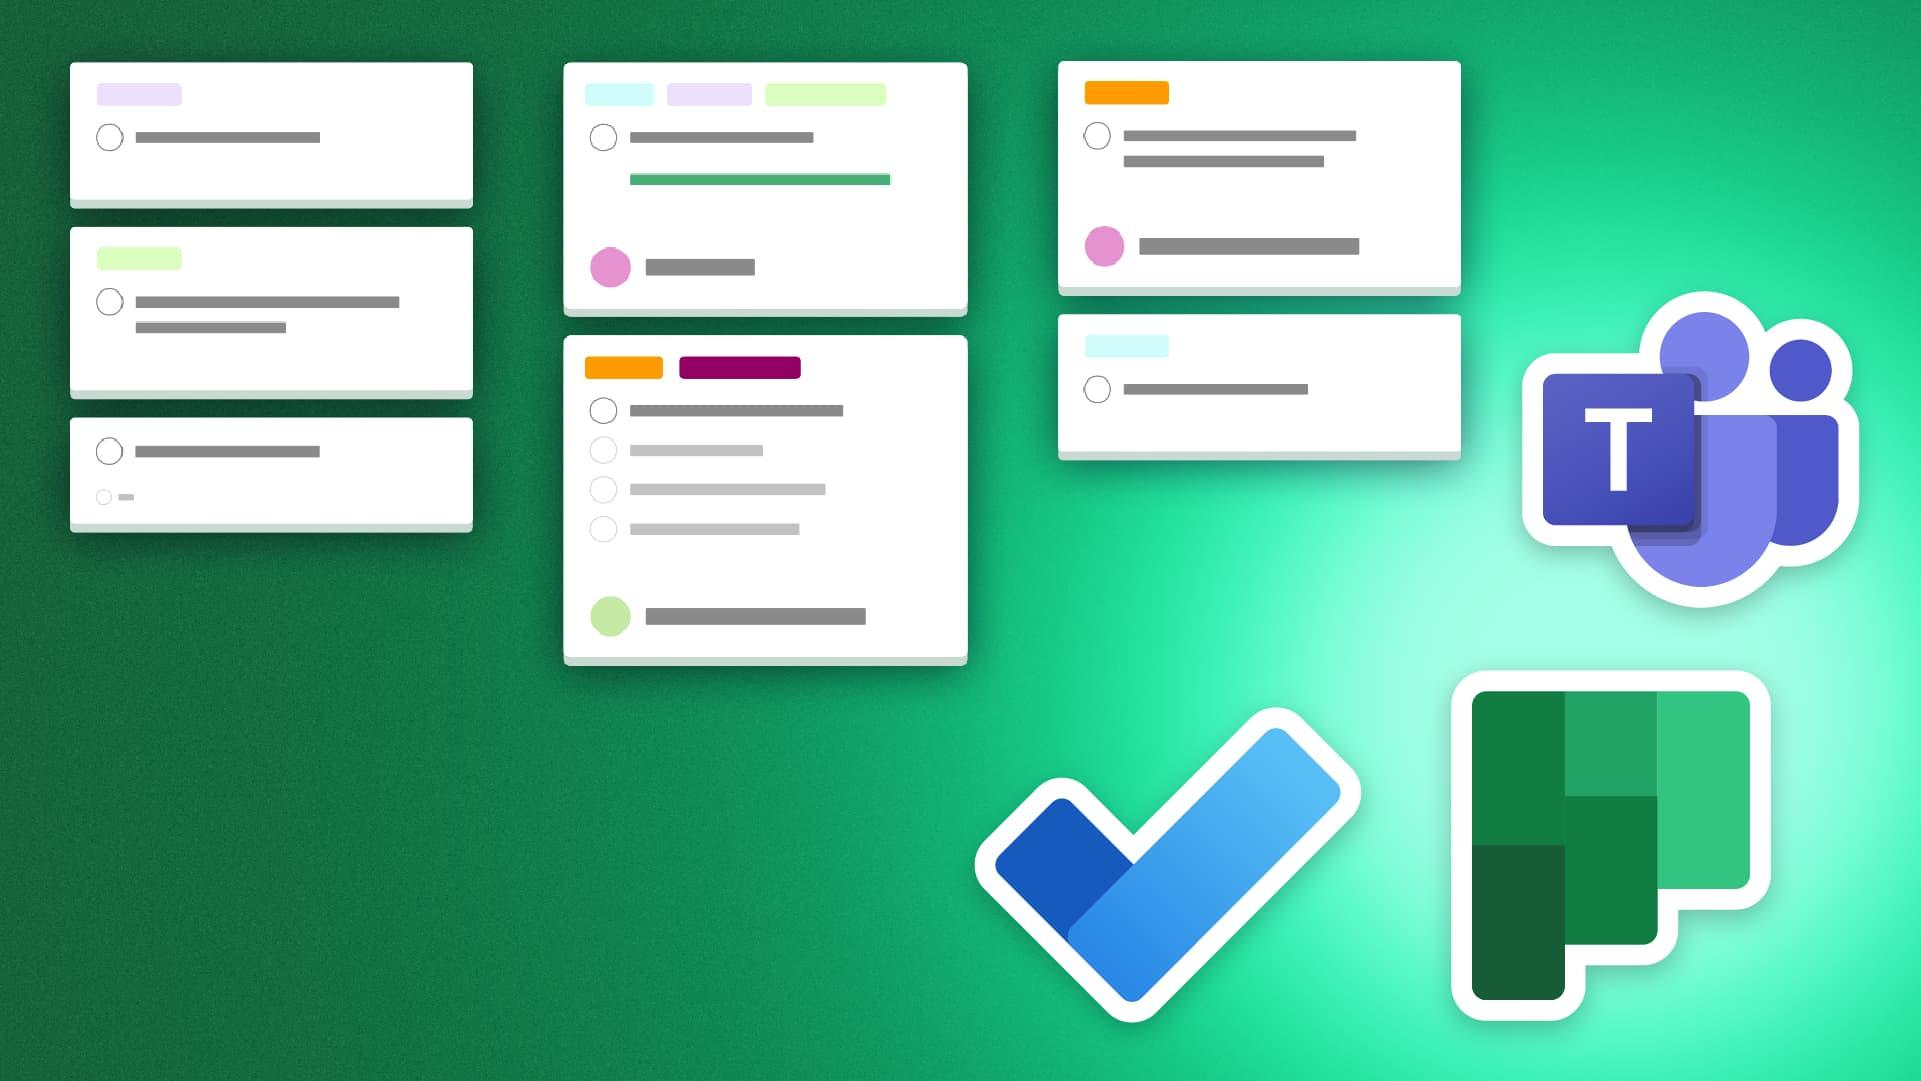 Task Management in Microsoft 365